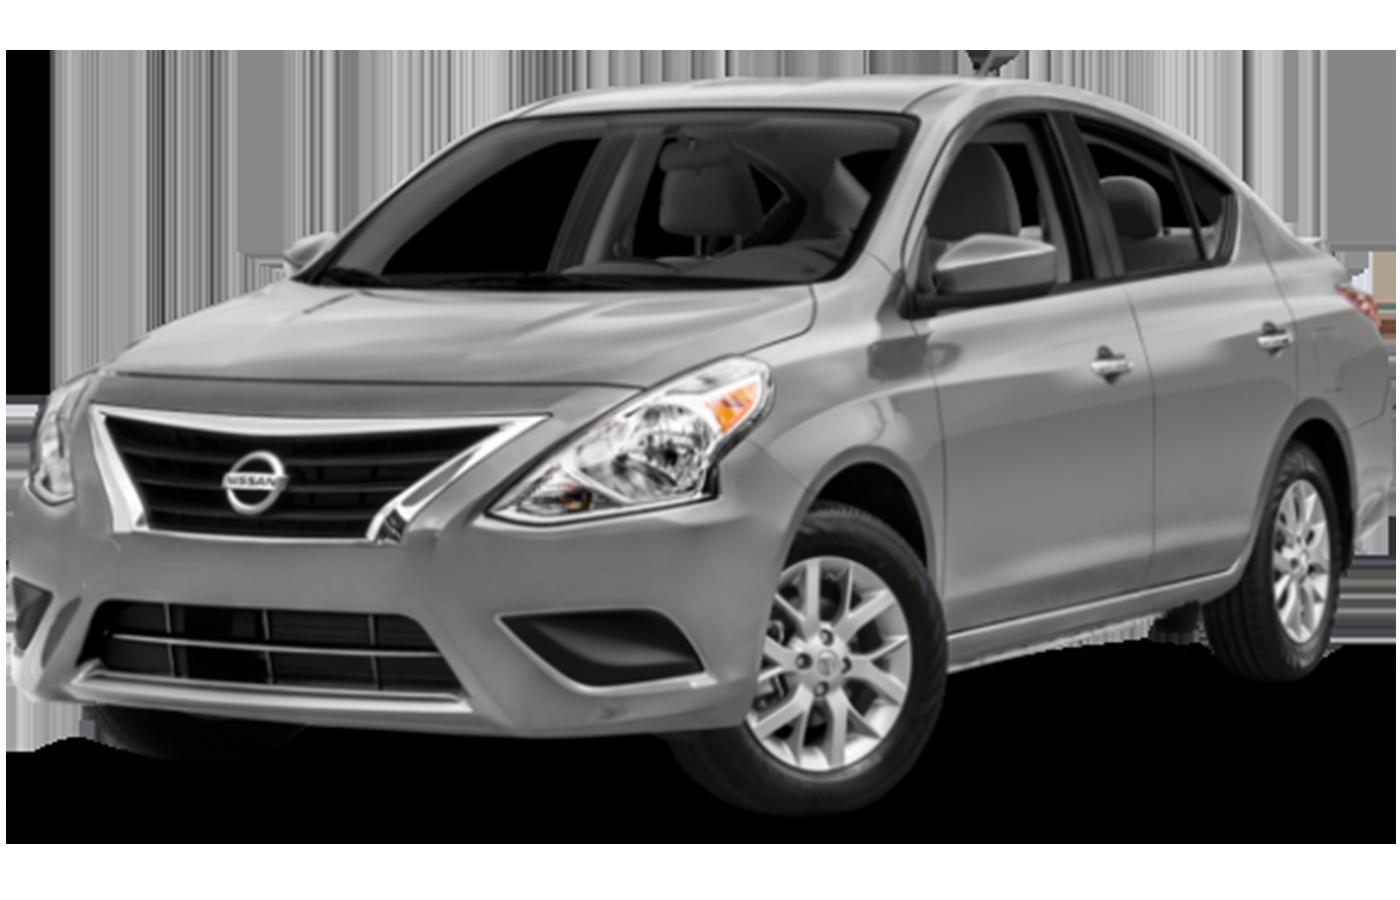 مواصفات سيارة نيسان صني 2019 Nissan Sunny Ex Plus Nissan Sunny Nissan Car